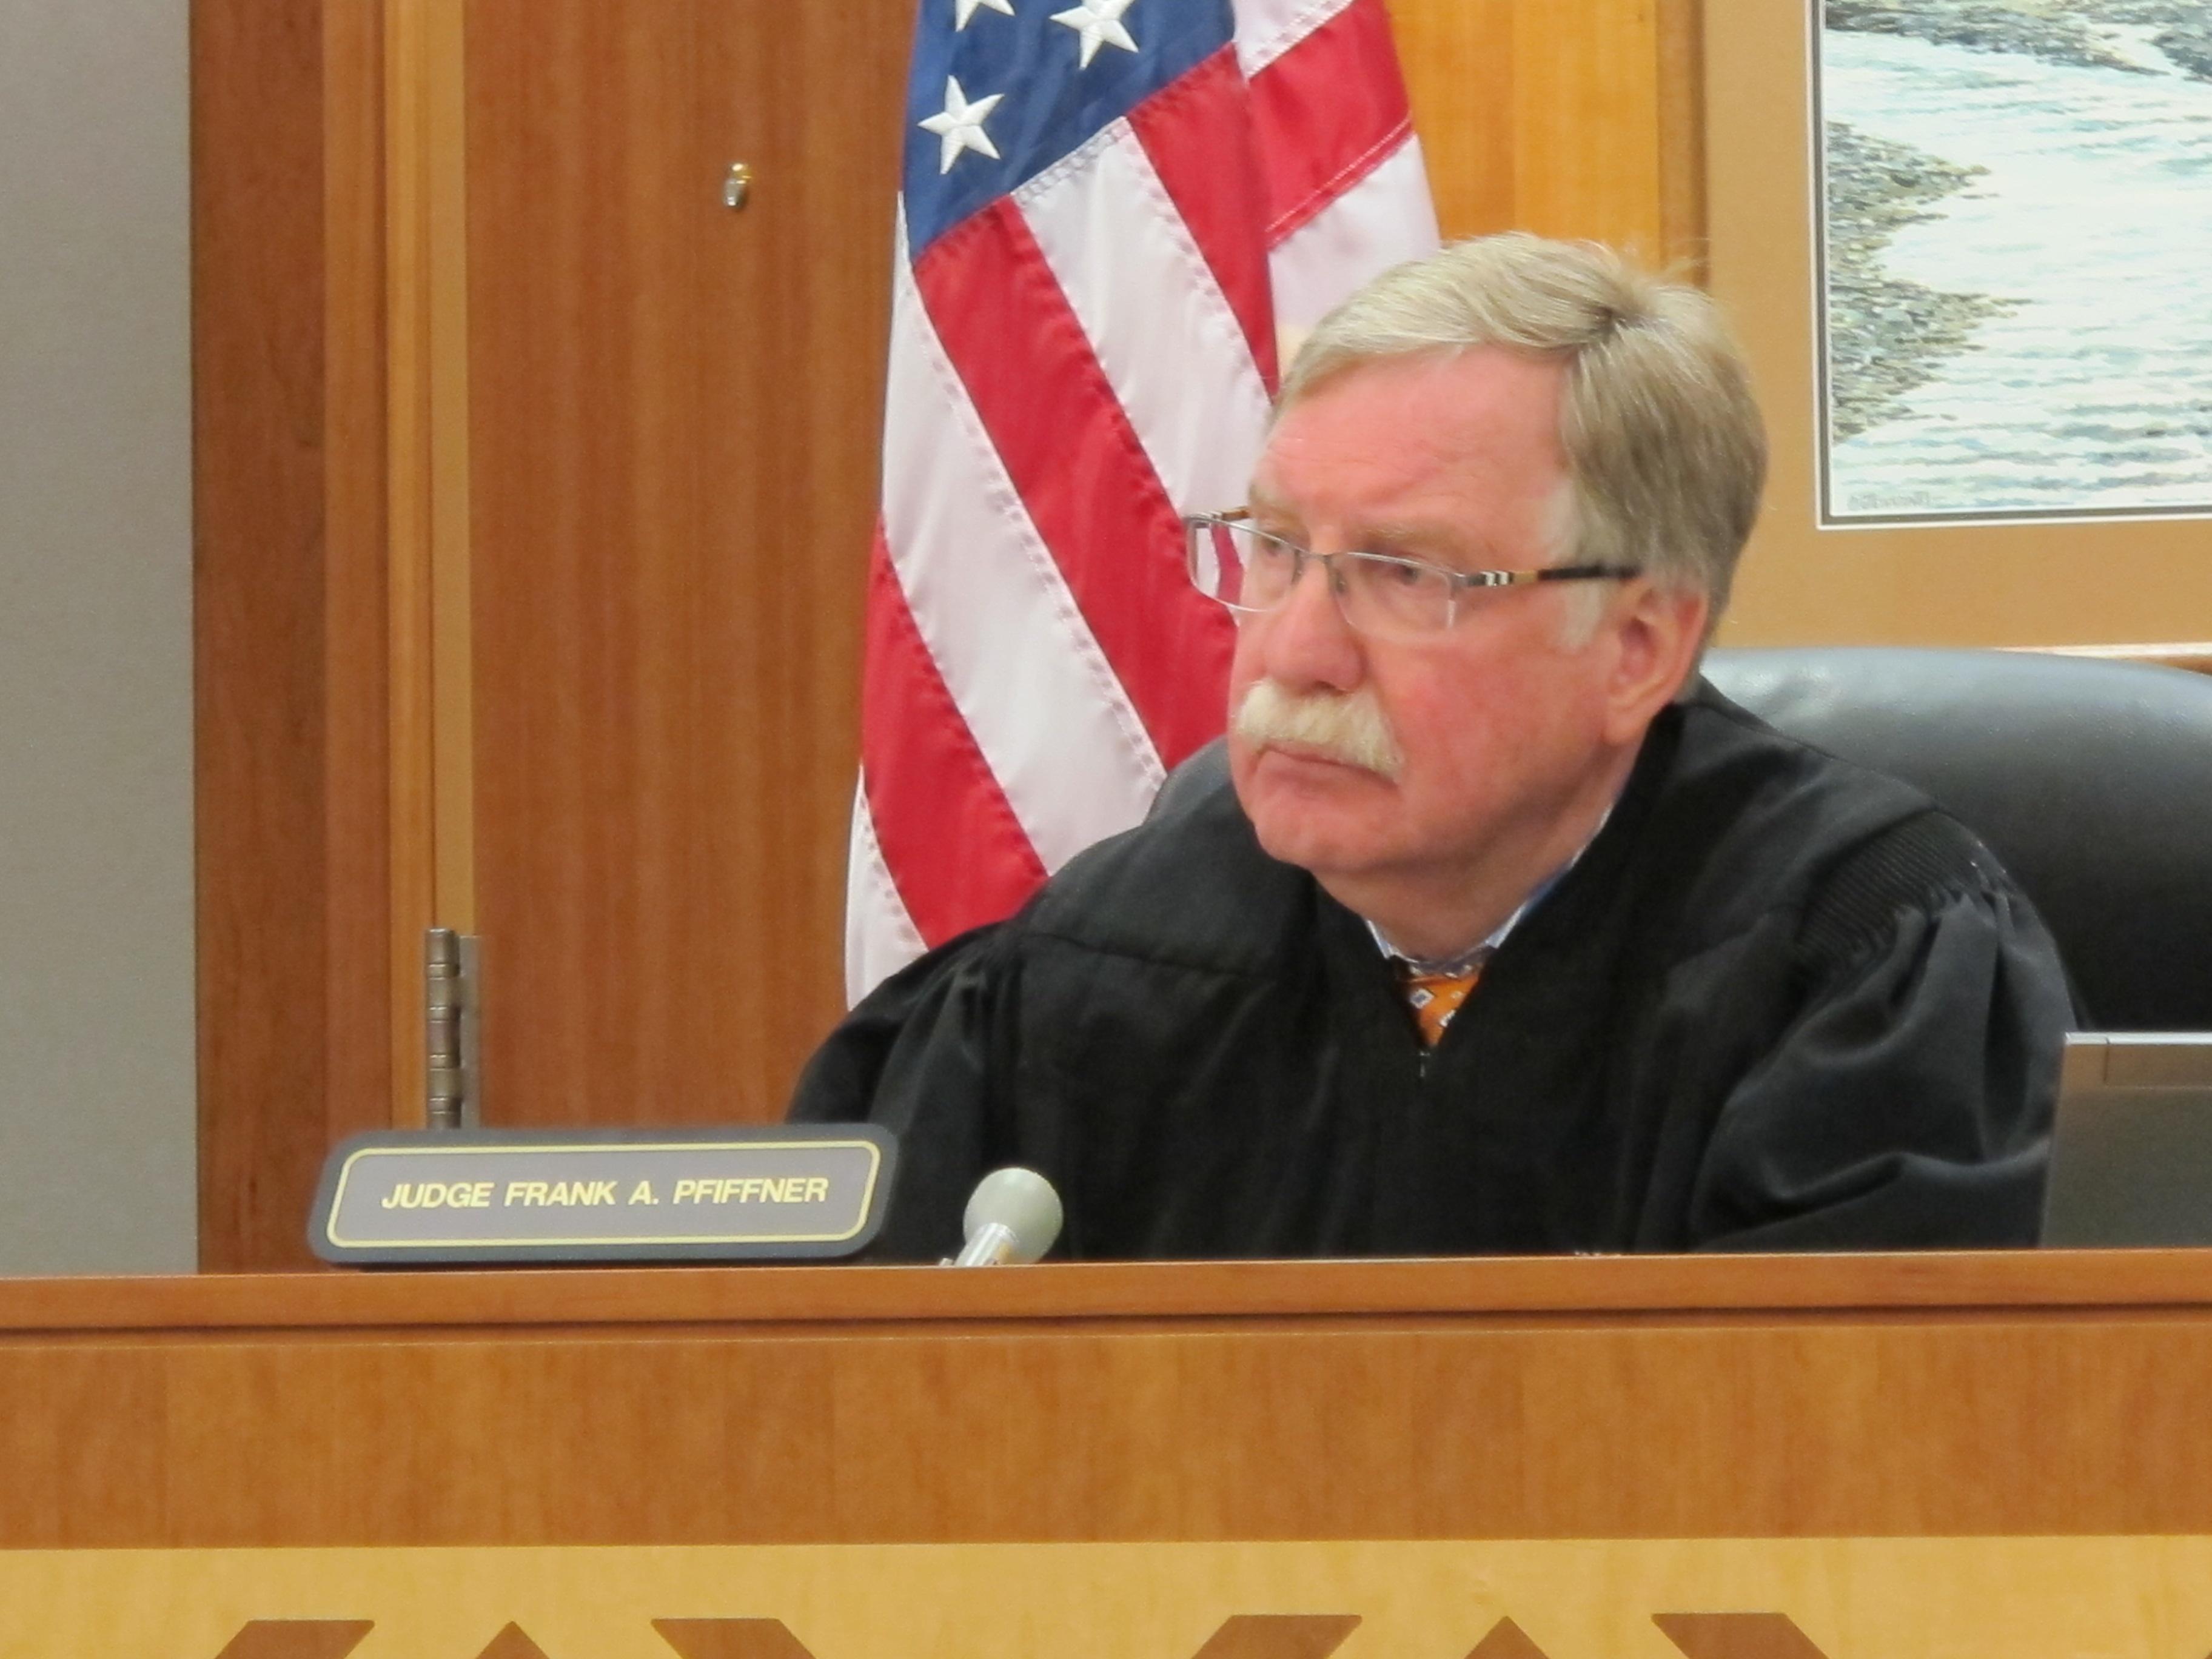 Judge Frank Pfiffner